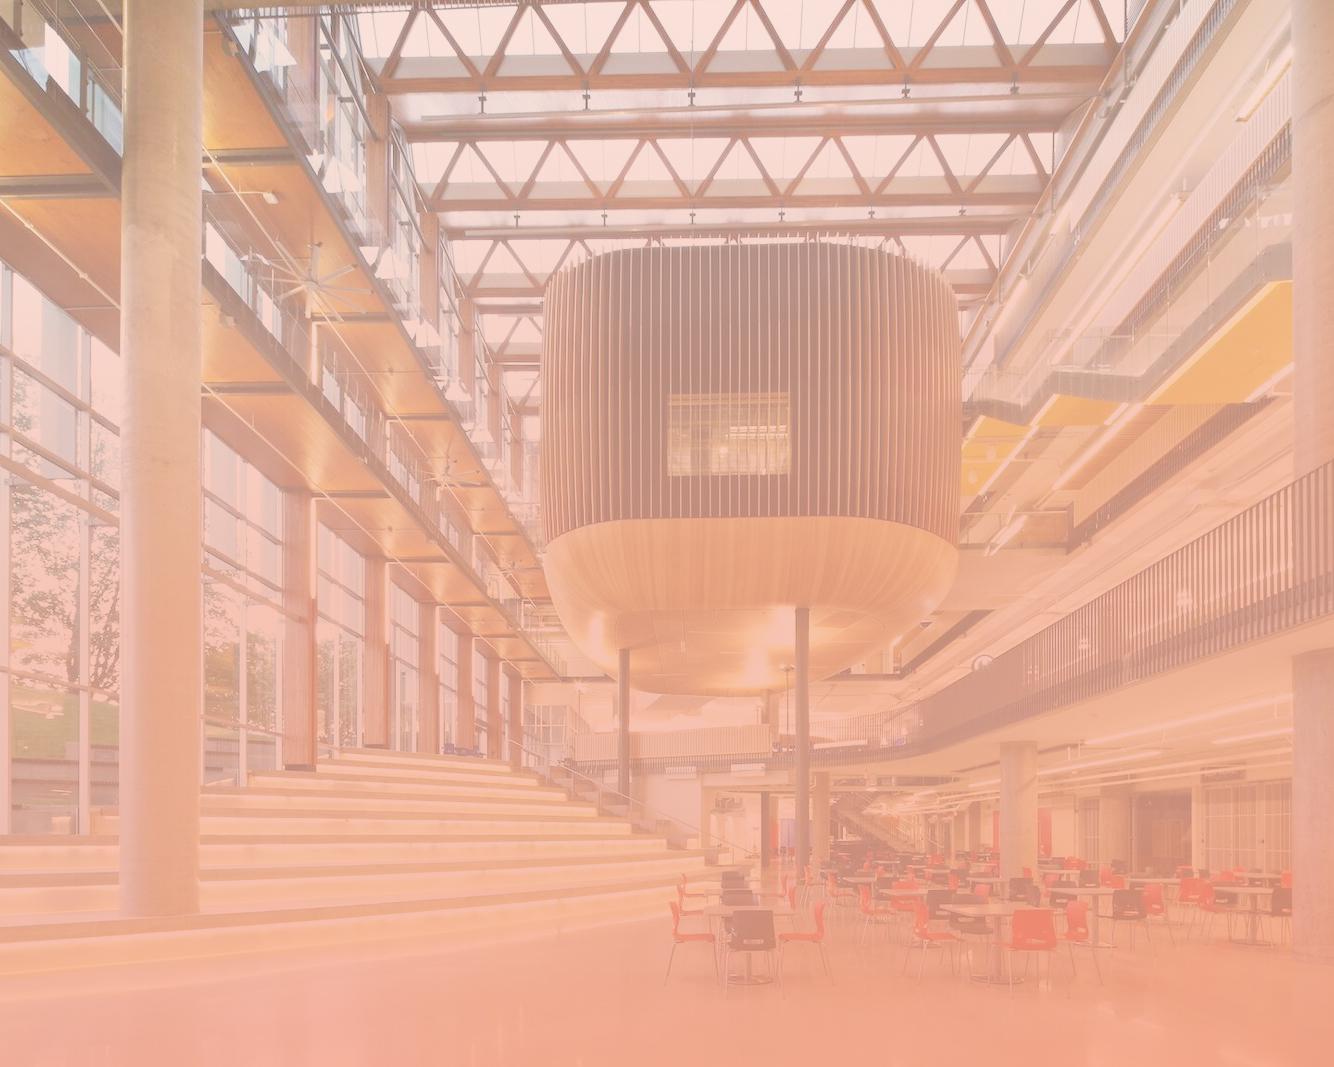 UBC STUDENT UNION BUILDING -